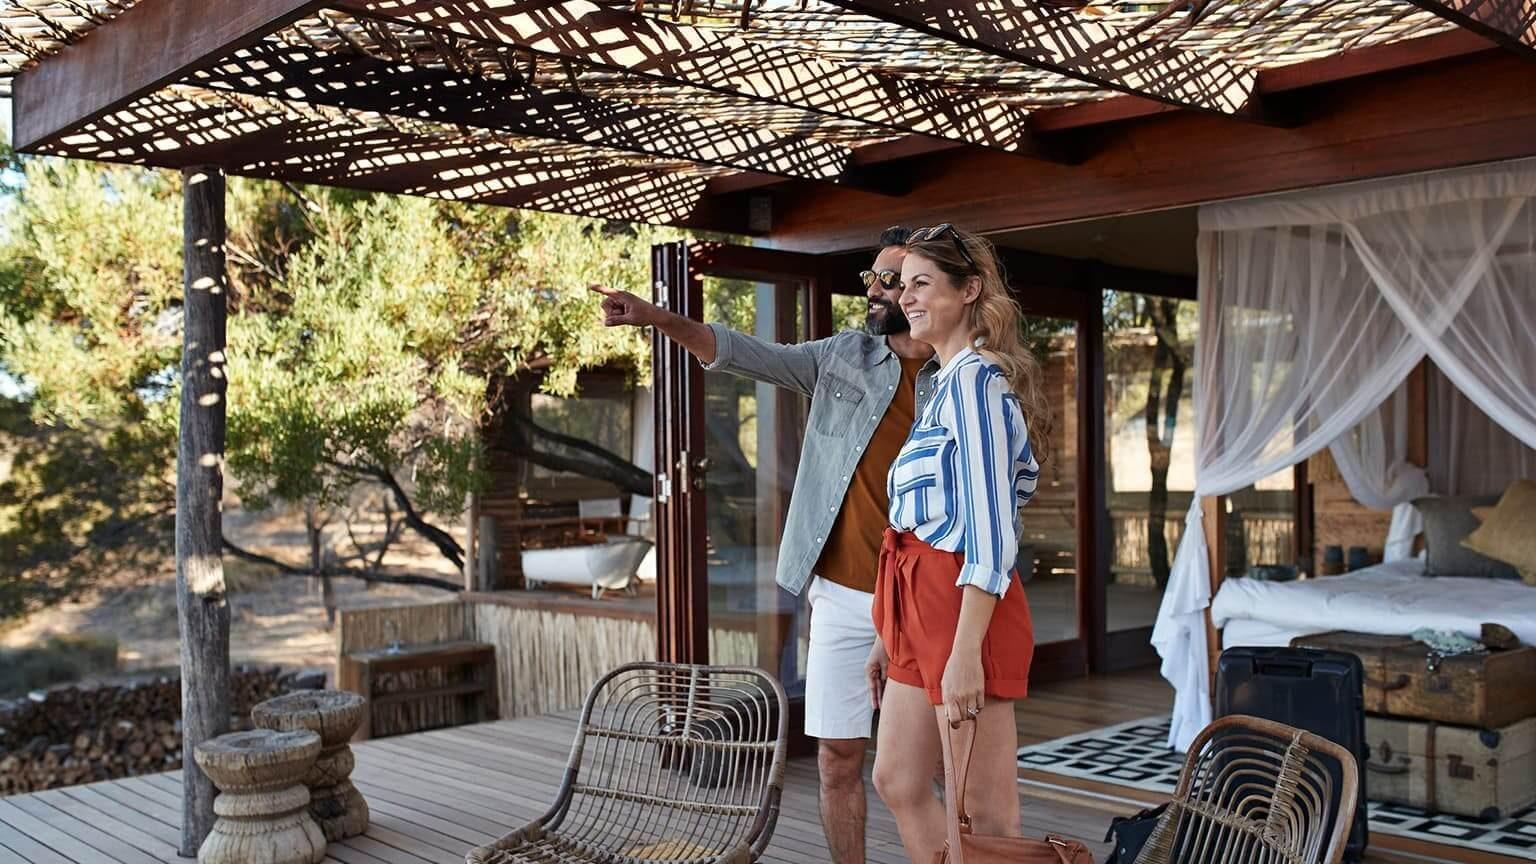 Couple having romantic getaway holiday in safari lodge